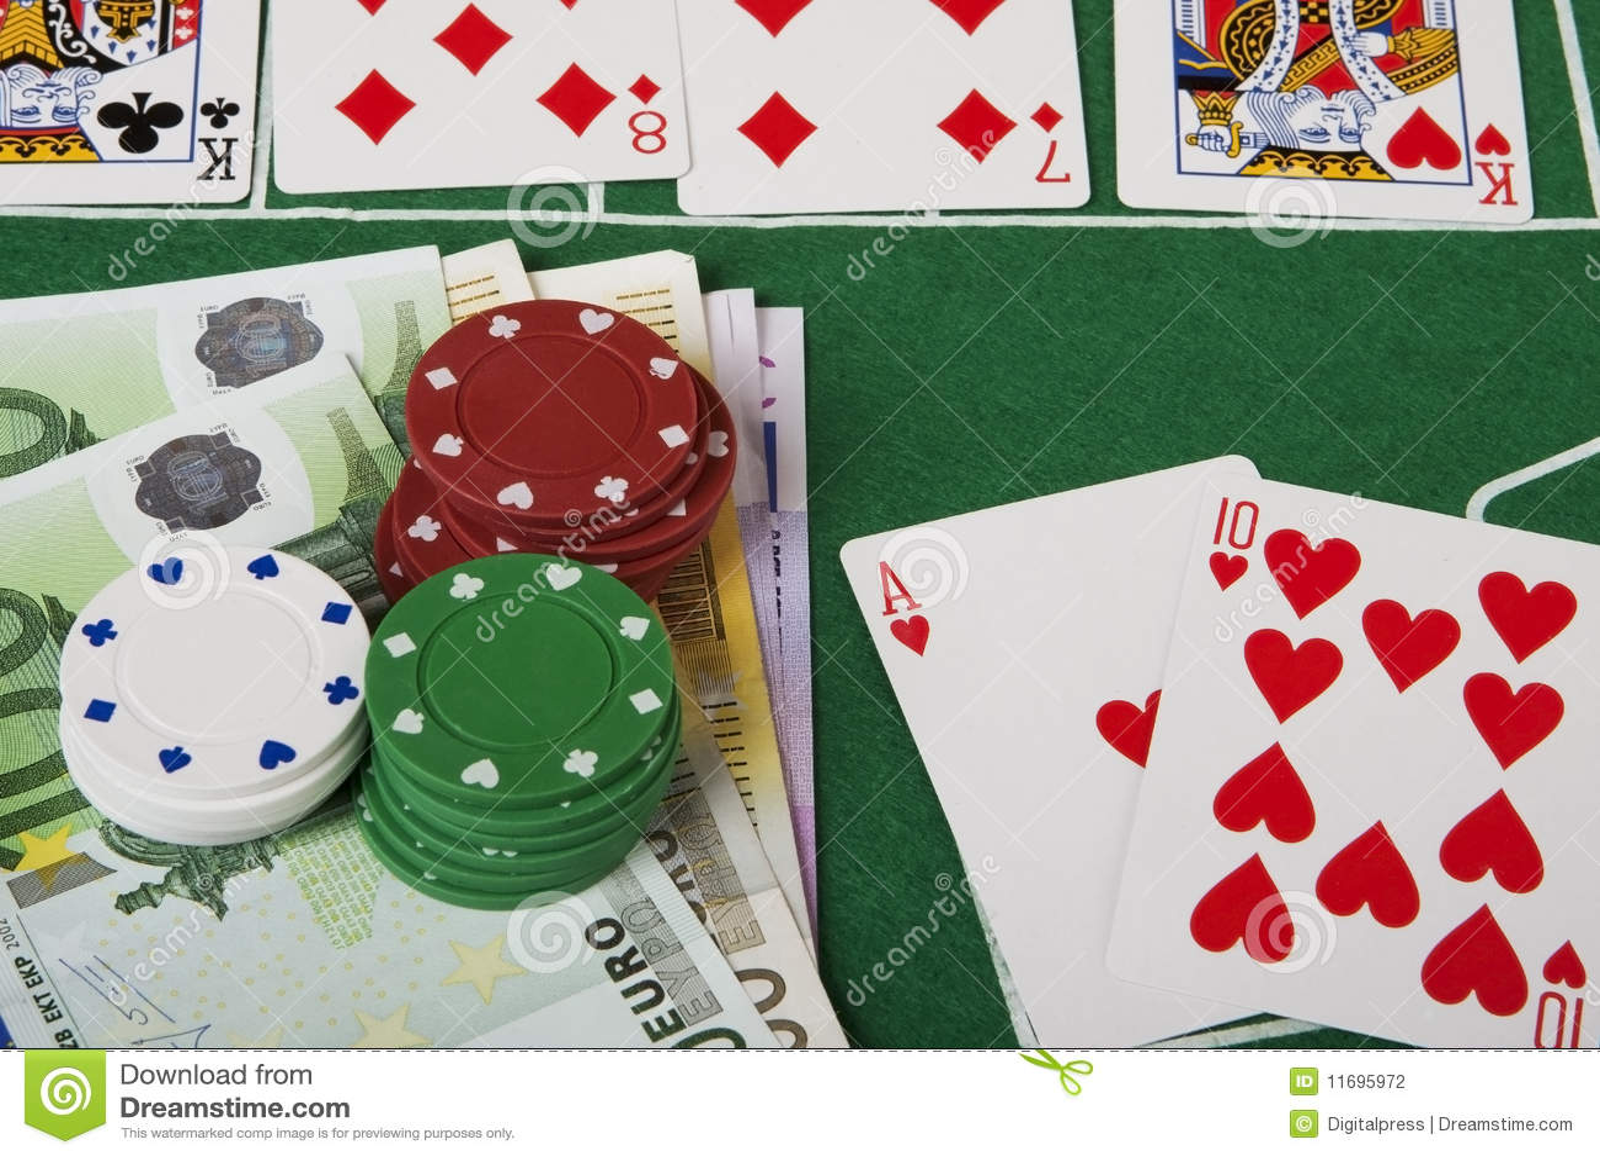 Fat jack gambling